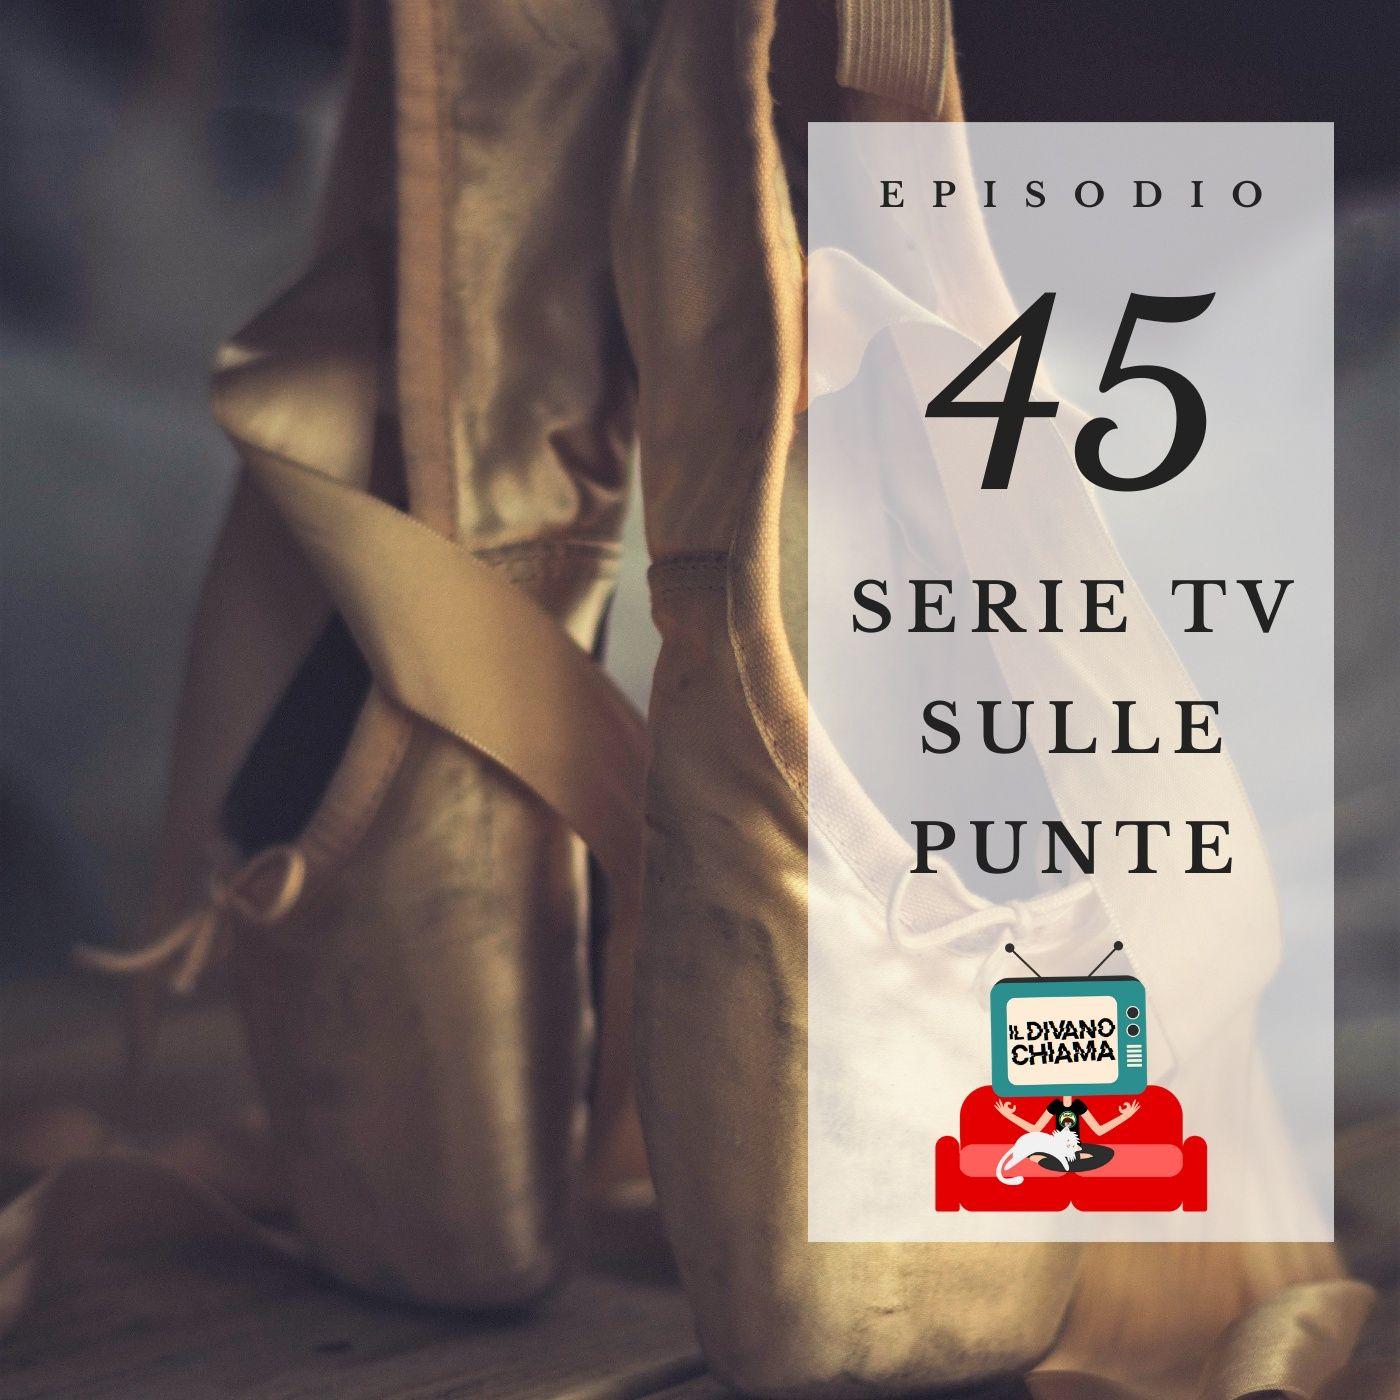 Puntata 45 - Serie TV sulle punte